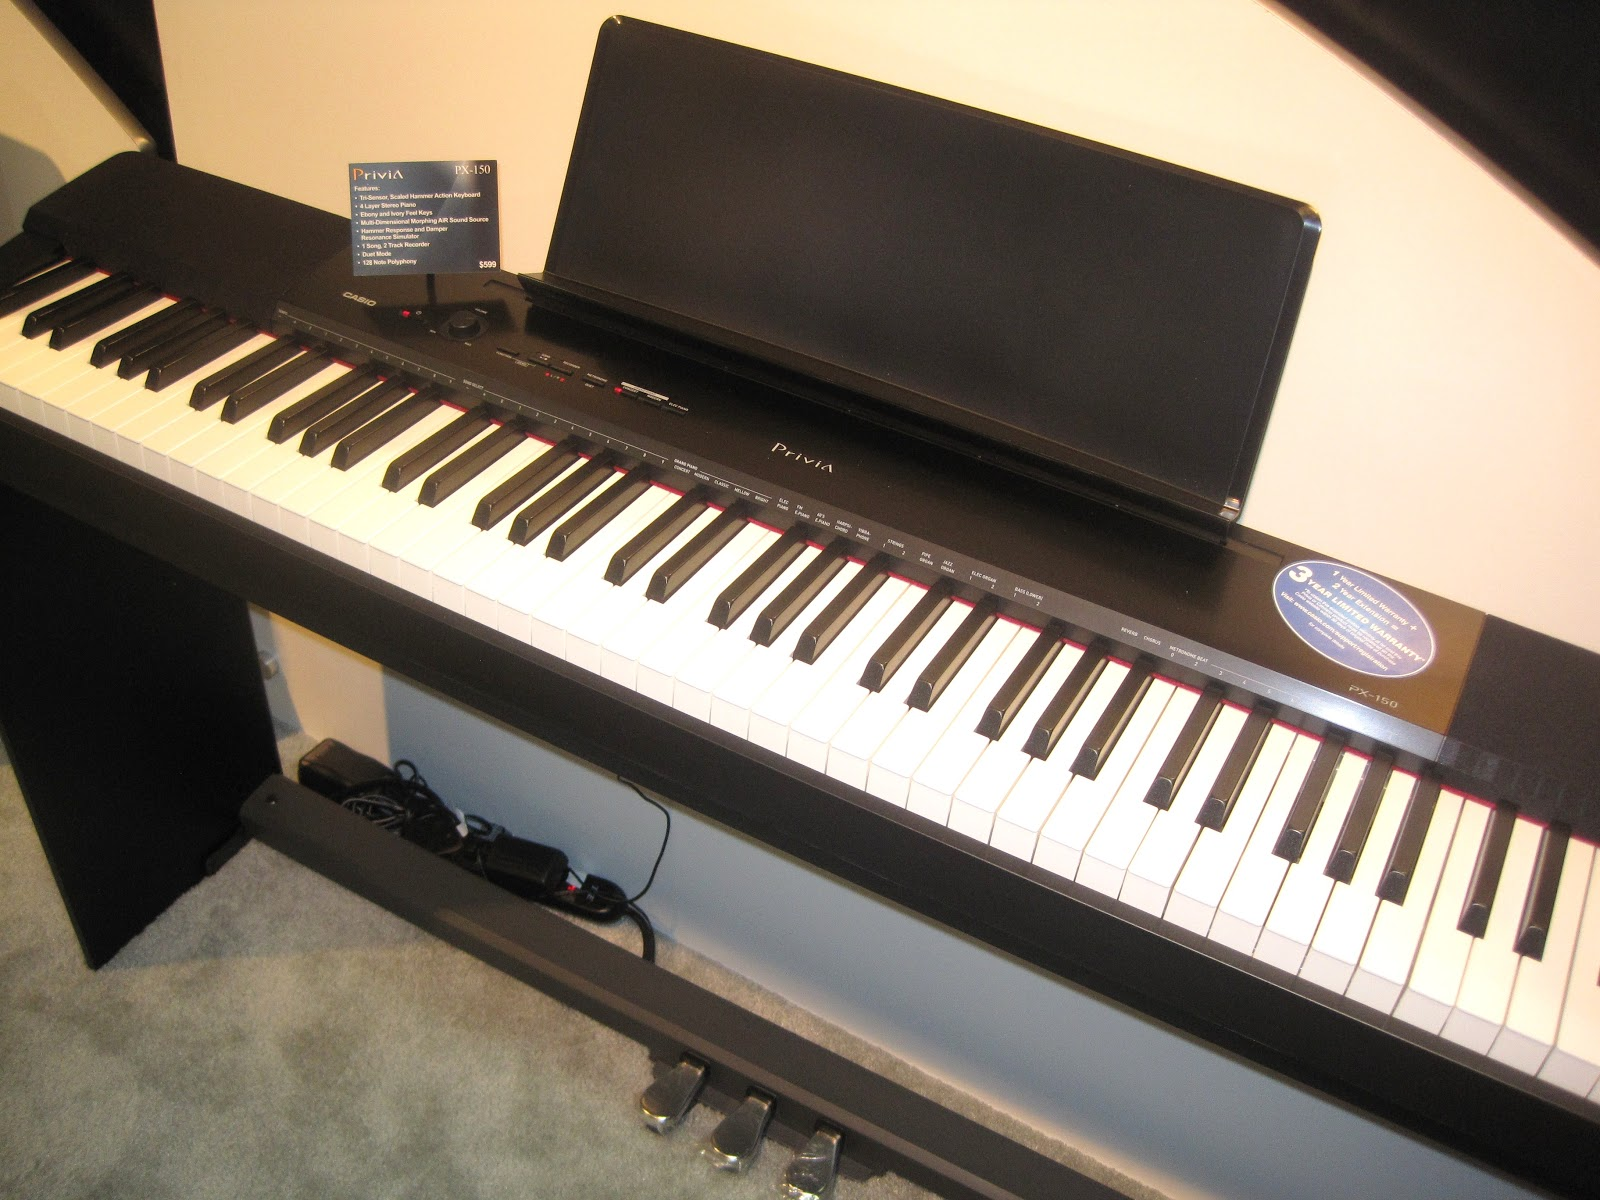 az piano reviews reviews williams allegro allegro 2 casio cdp100 digital pianos low. Black Bedroom Furniture Sets. Home Design Ideas